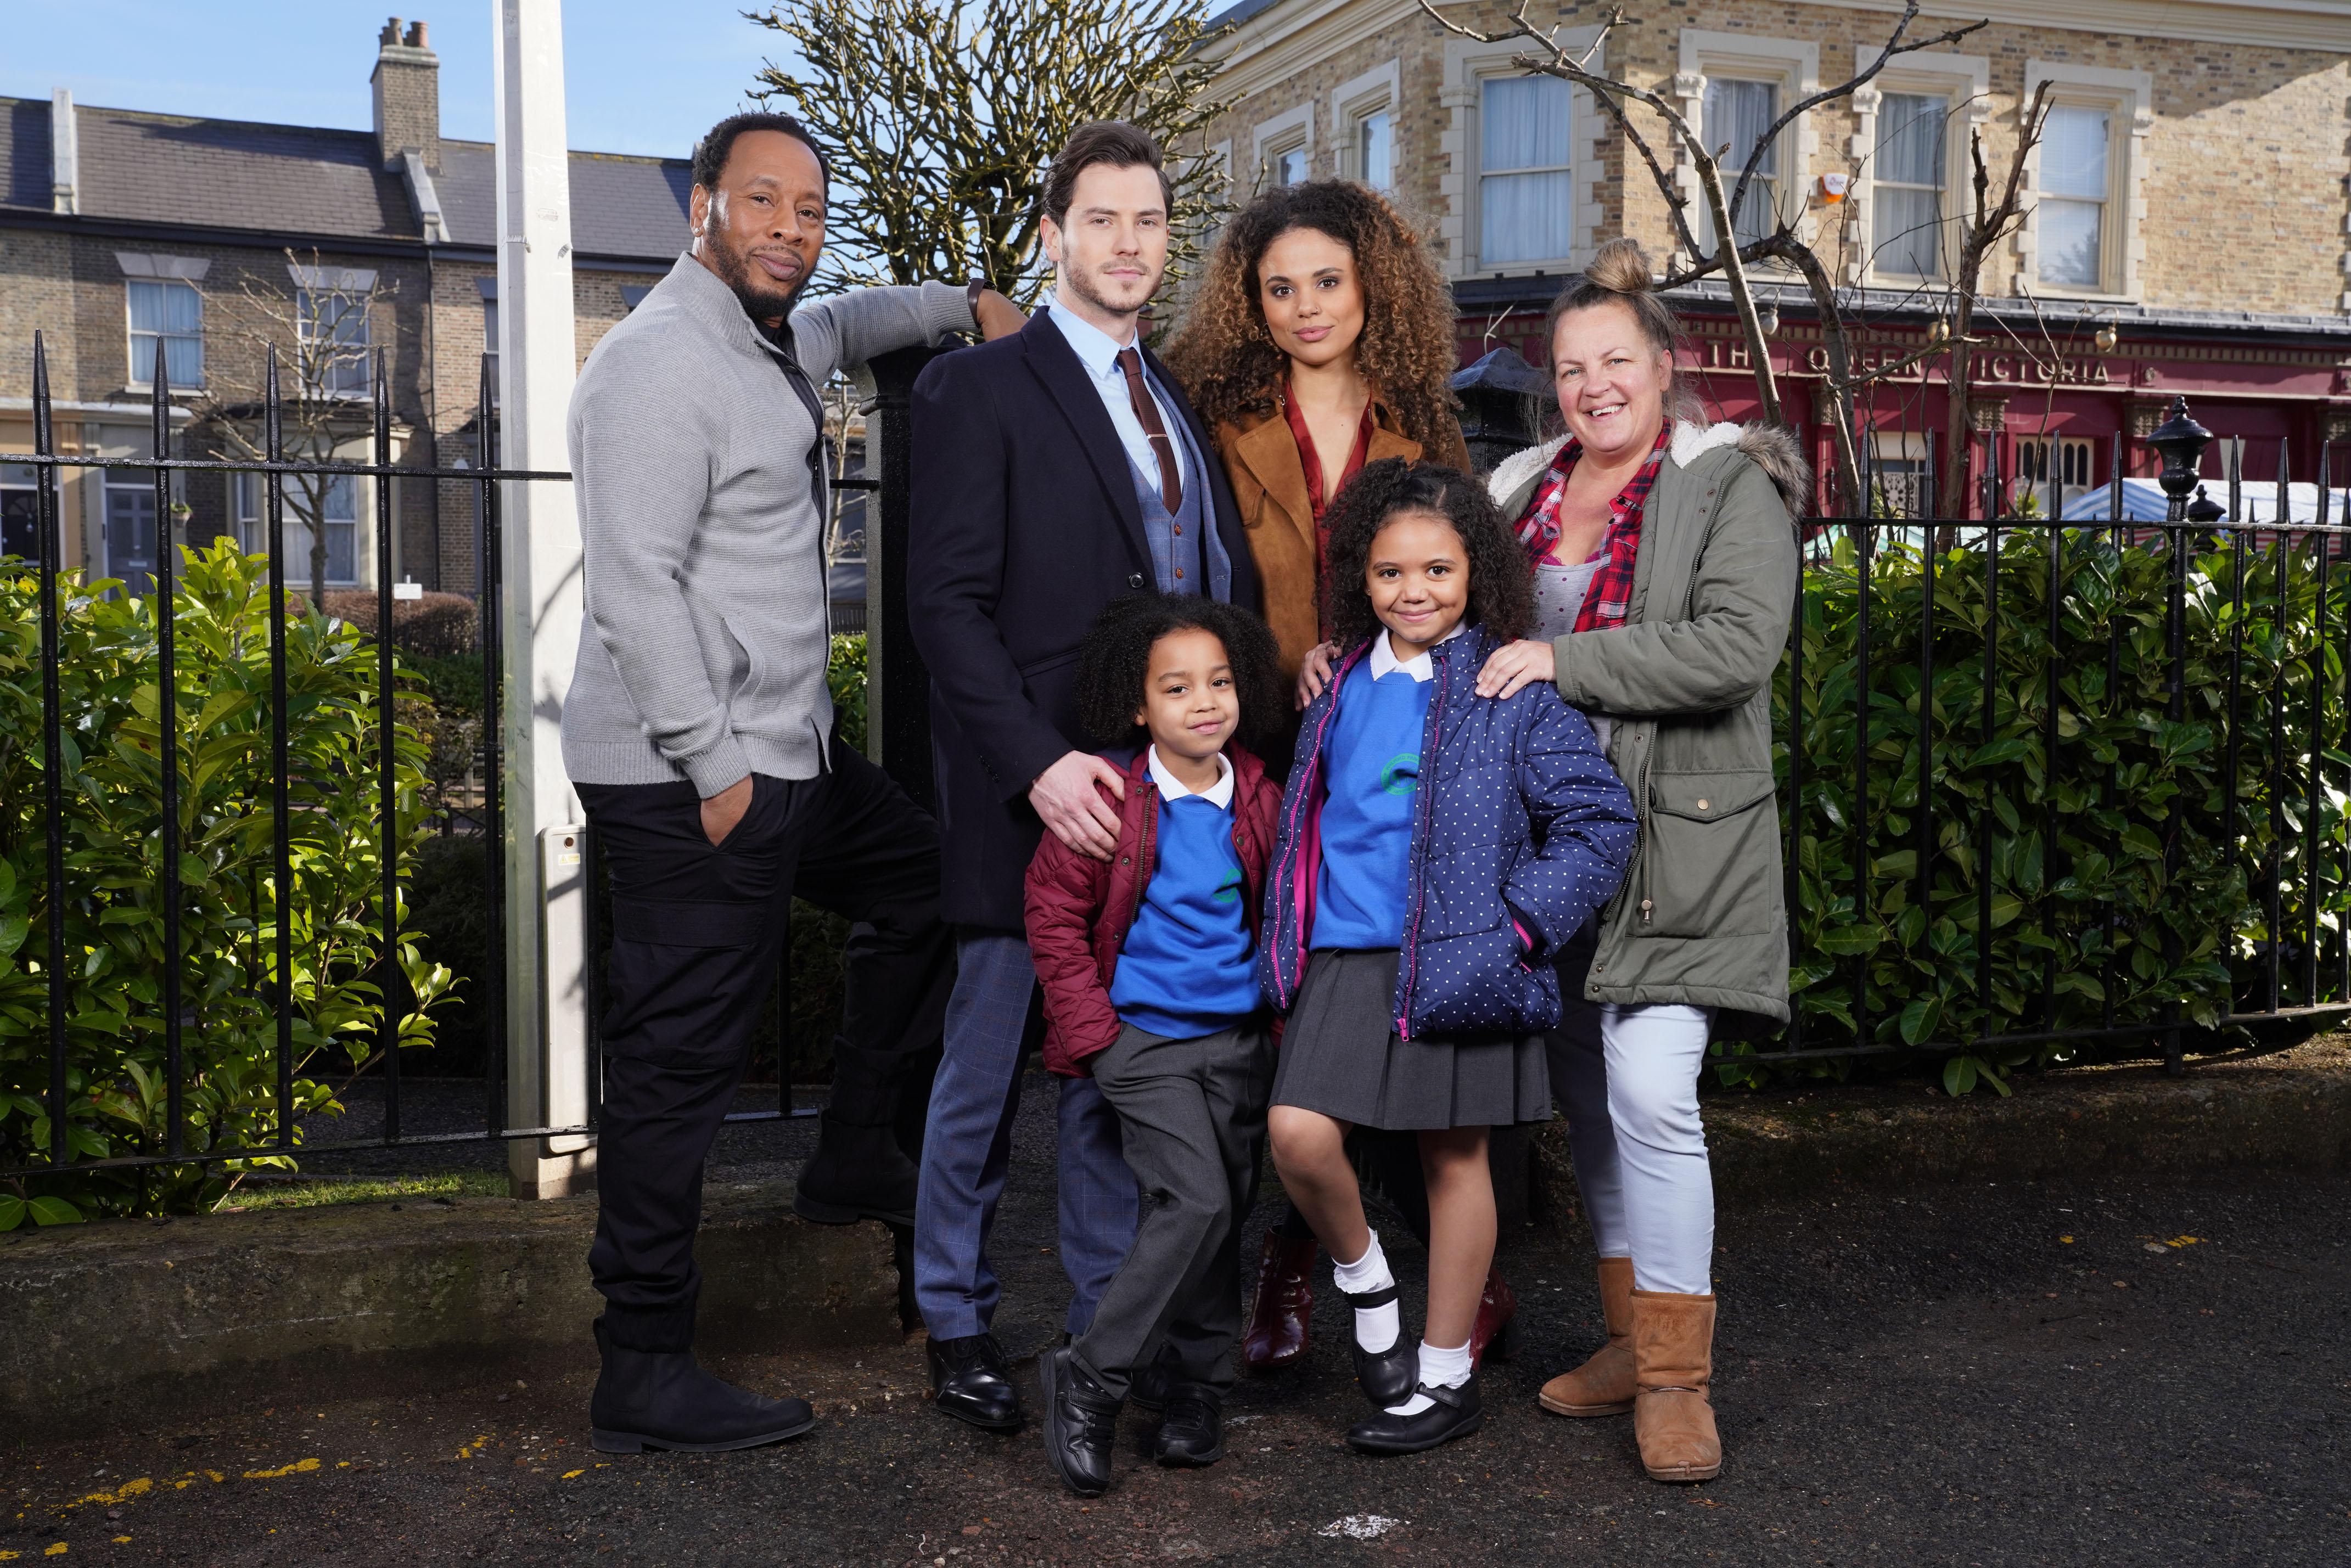 EastEnders SPOILER: Meet the new Atkins family